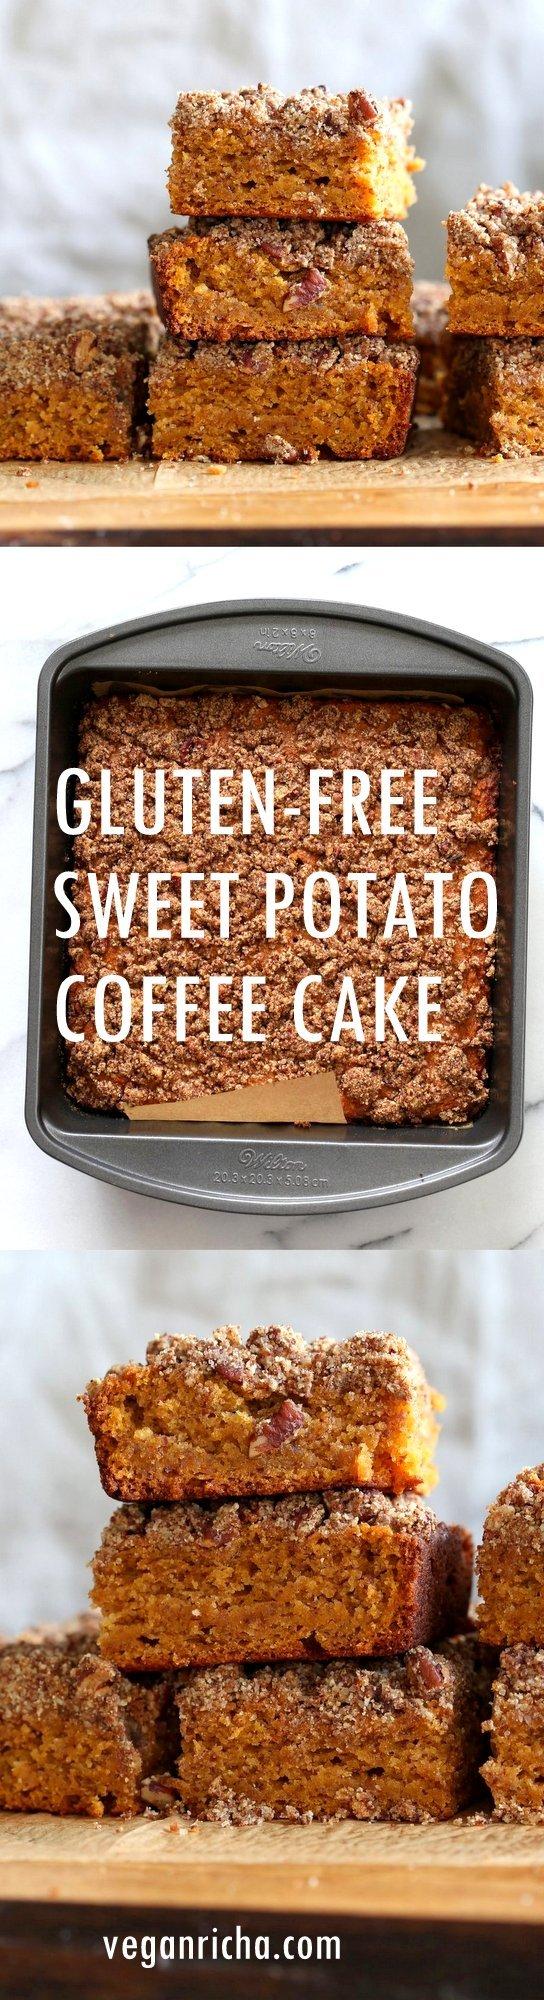 Gluten Free Sweet Potato Coffee Cake